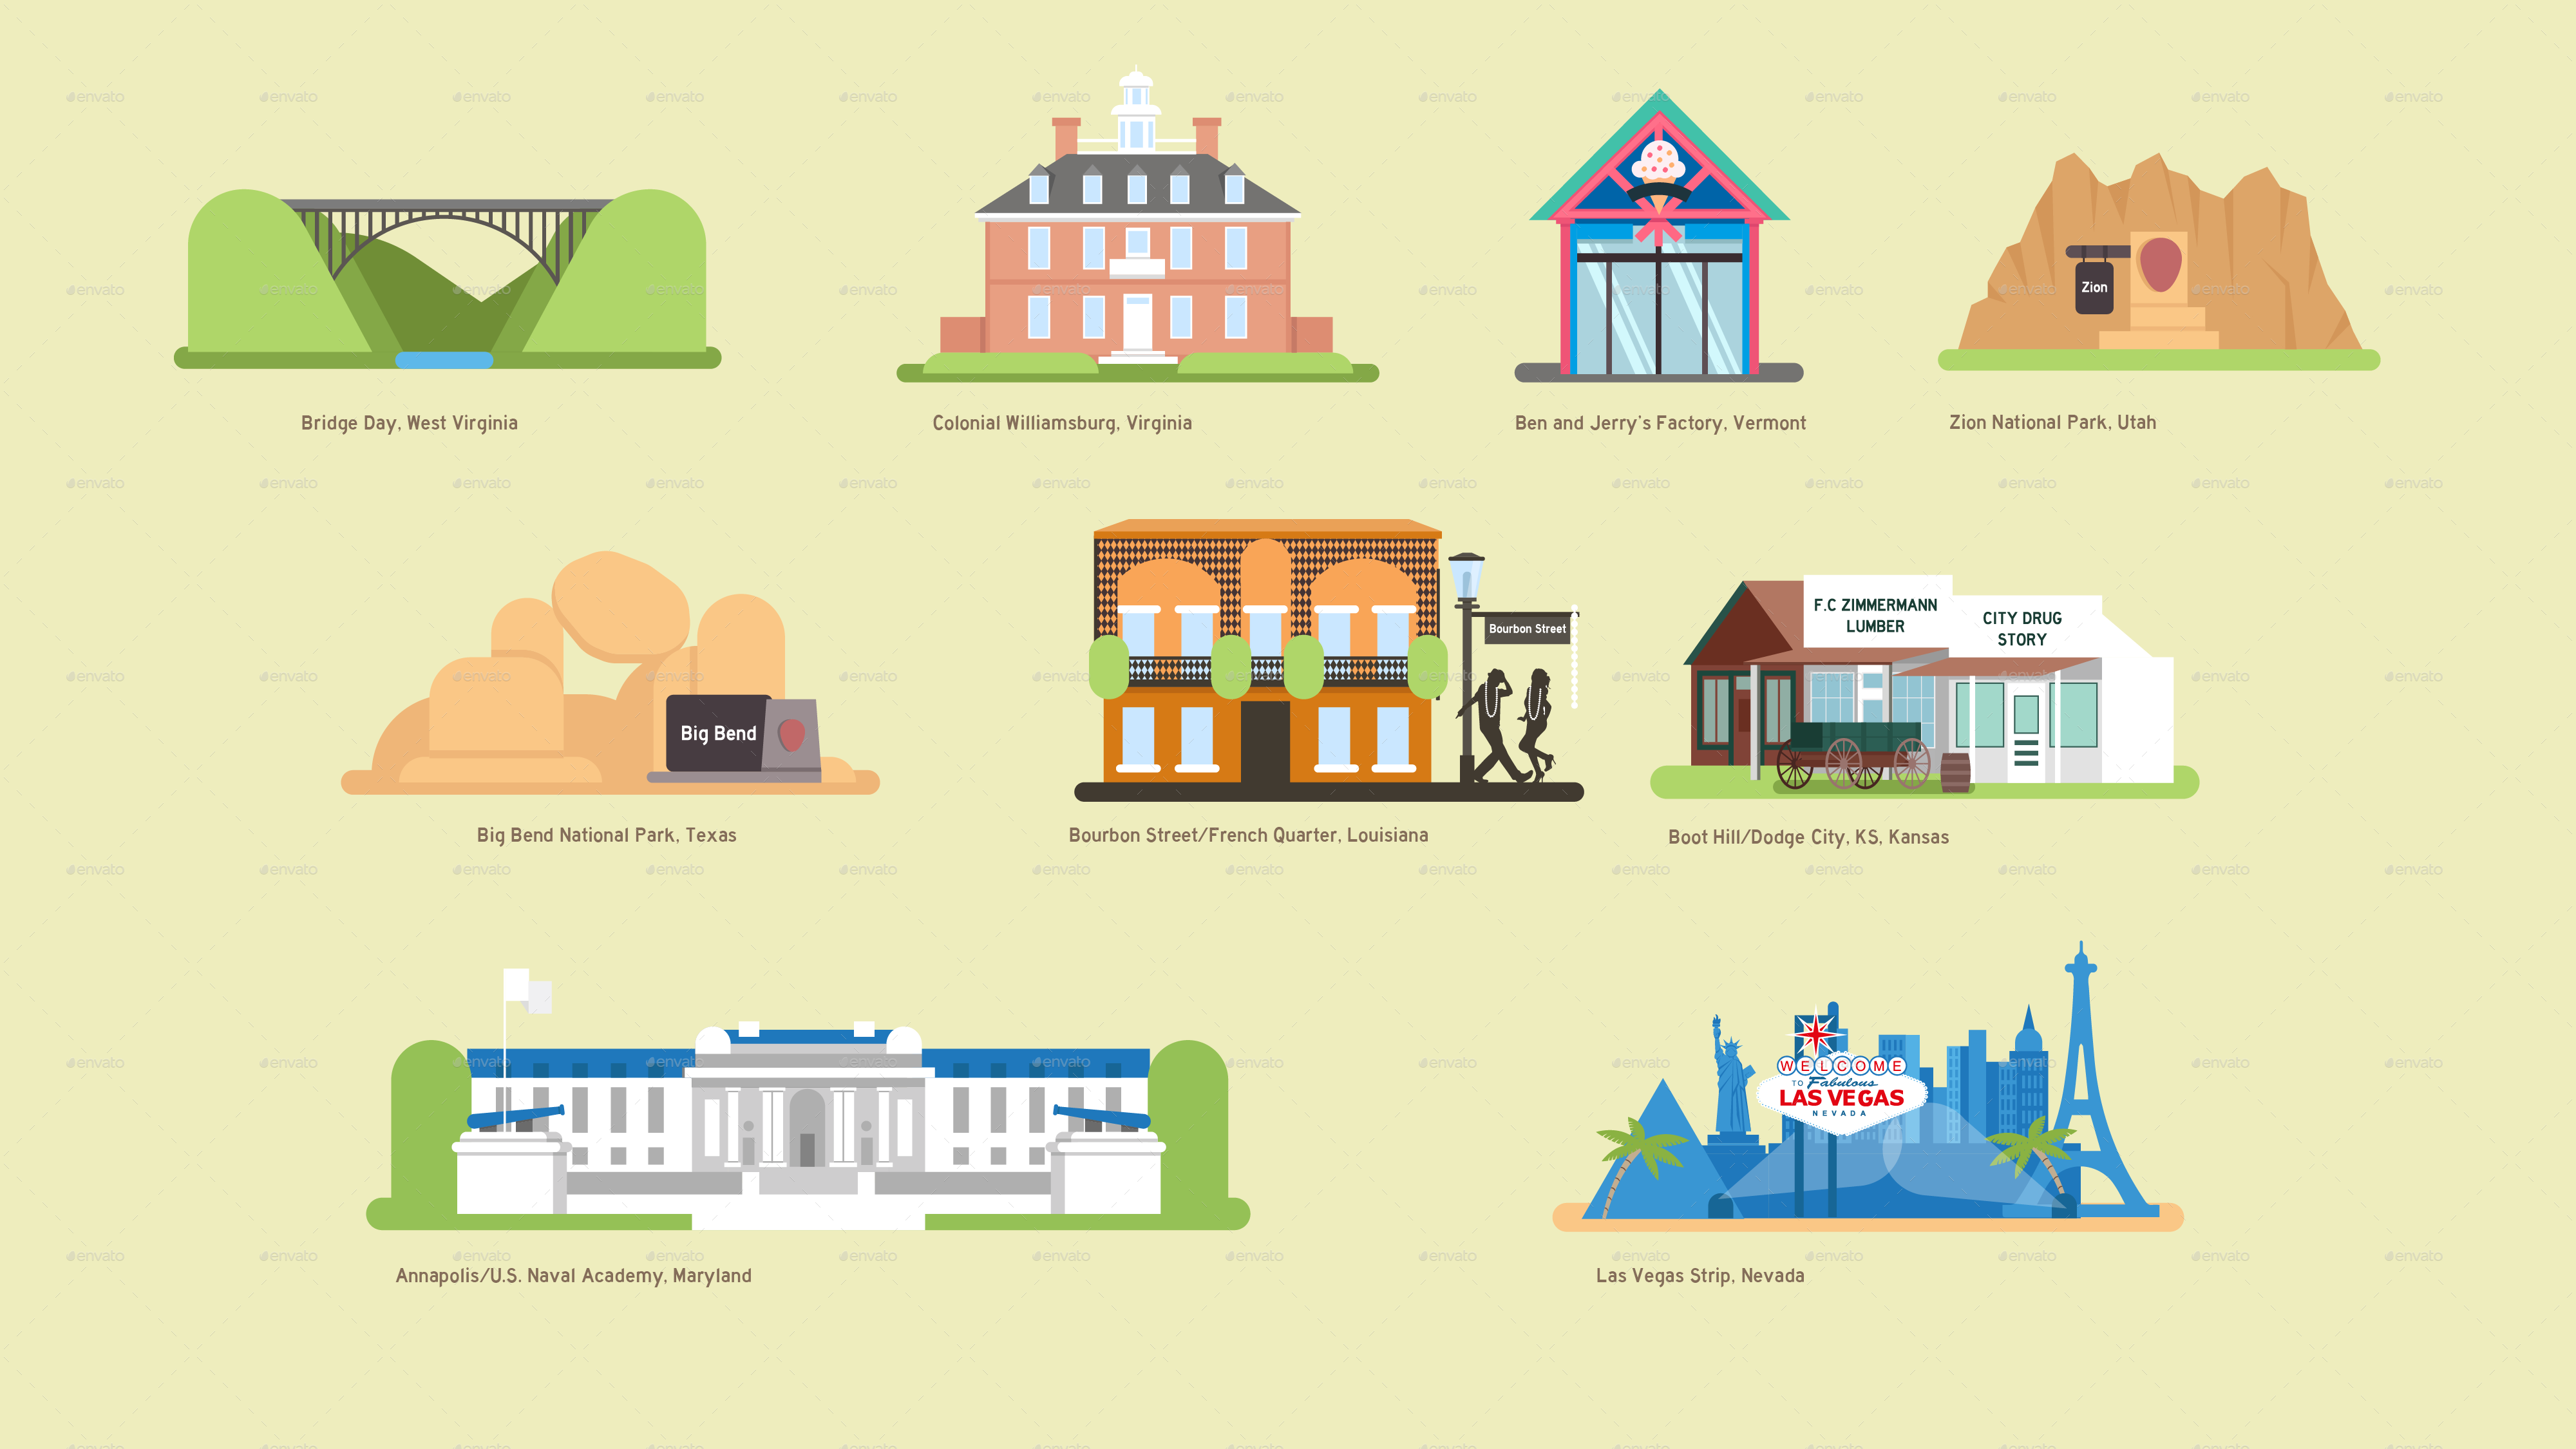 USA Vector Map And US Landmark Icons By DEMG GraphicRiver - Usa map and landmarks